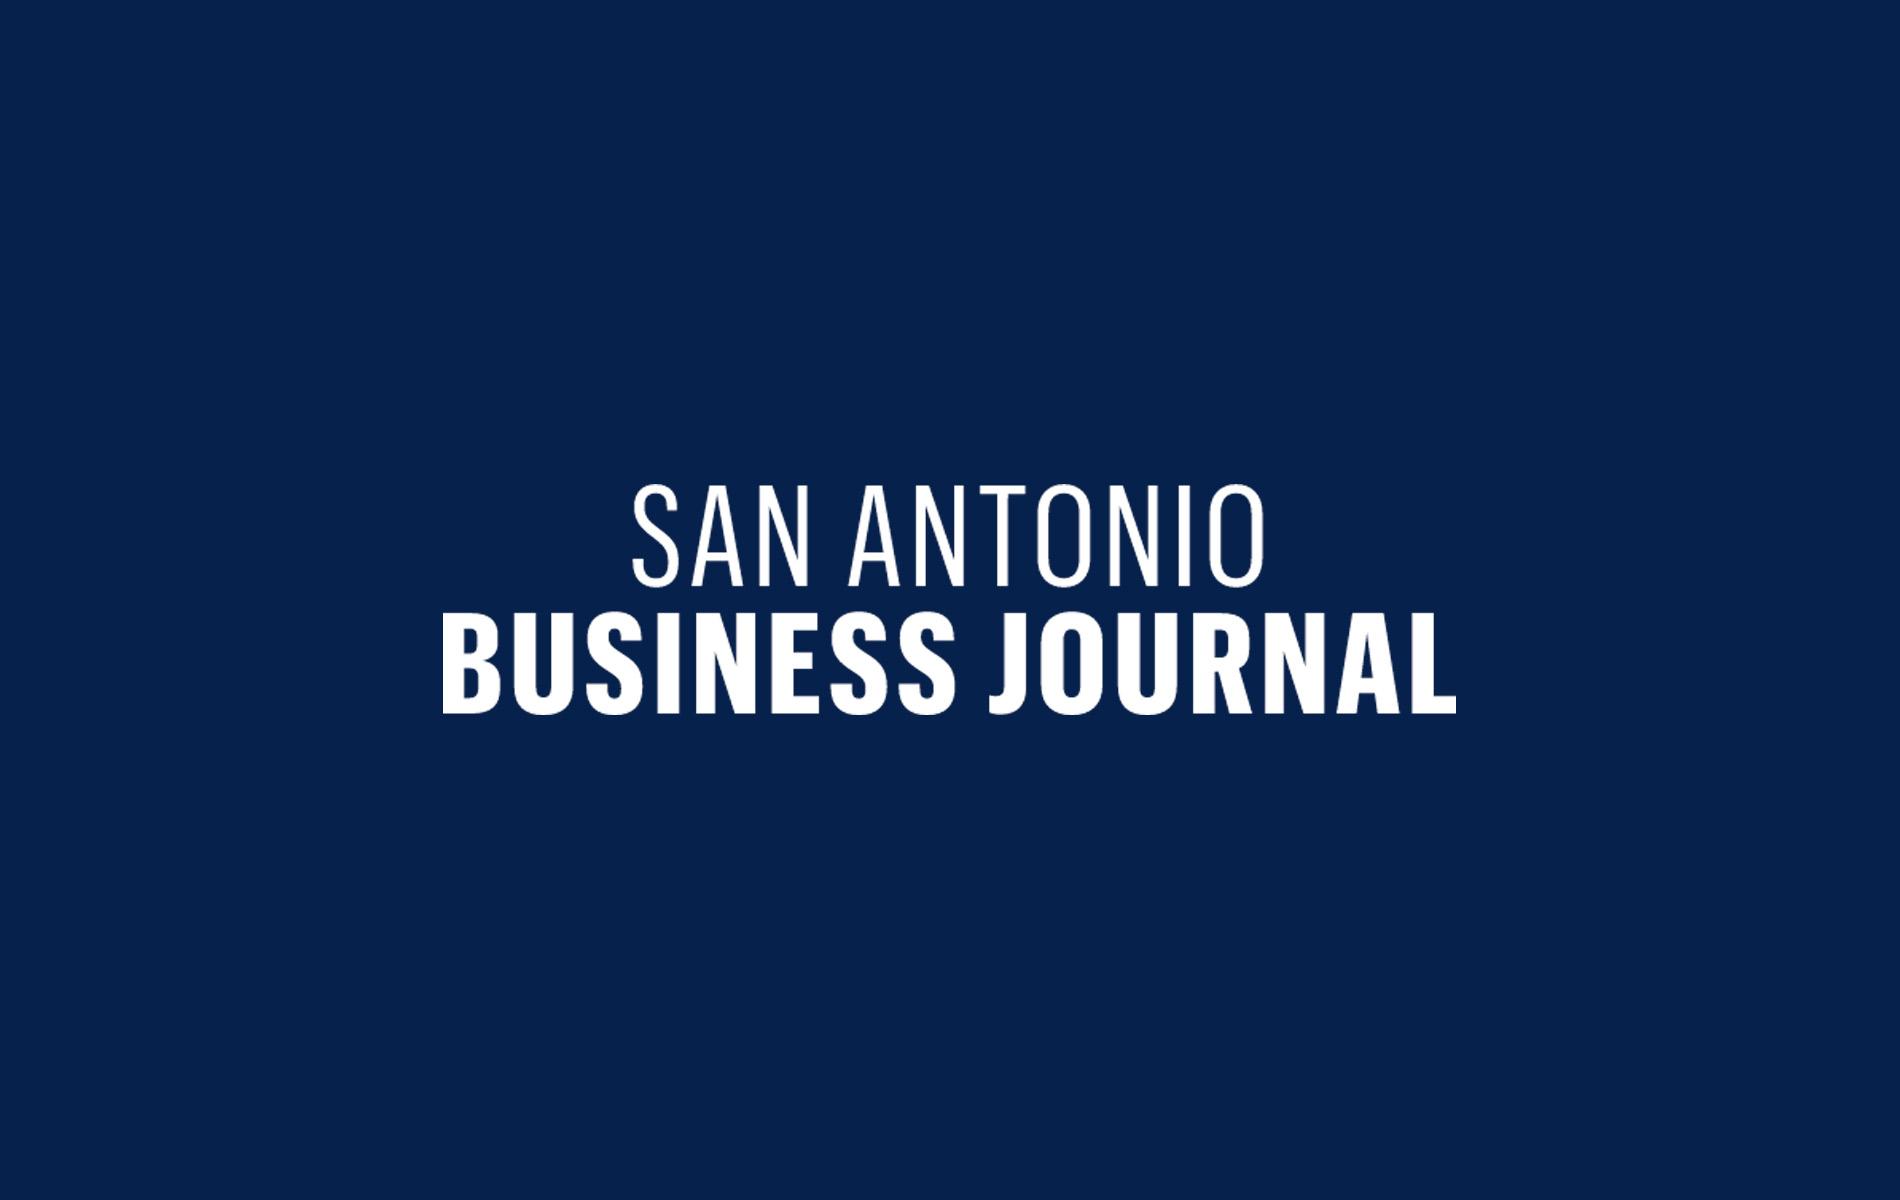 San Antonio Business Journal logo